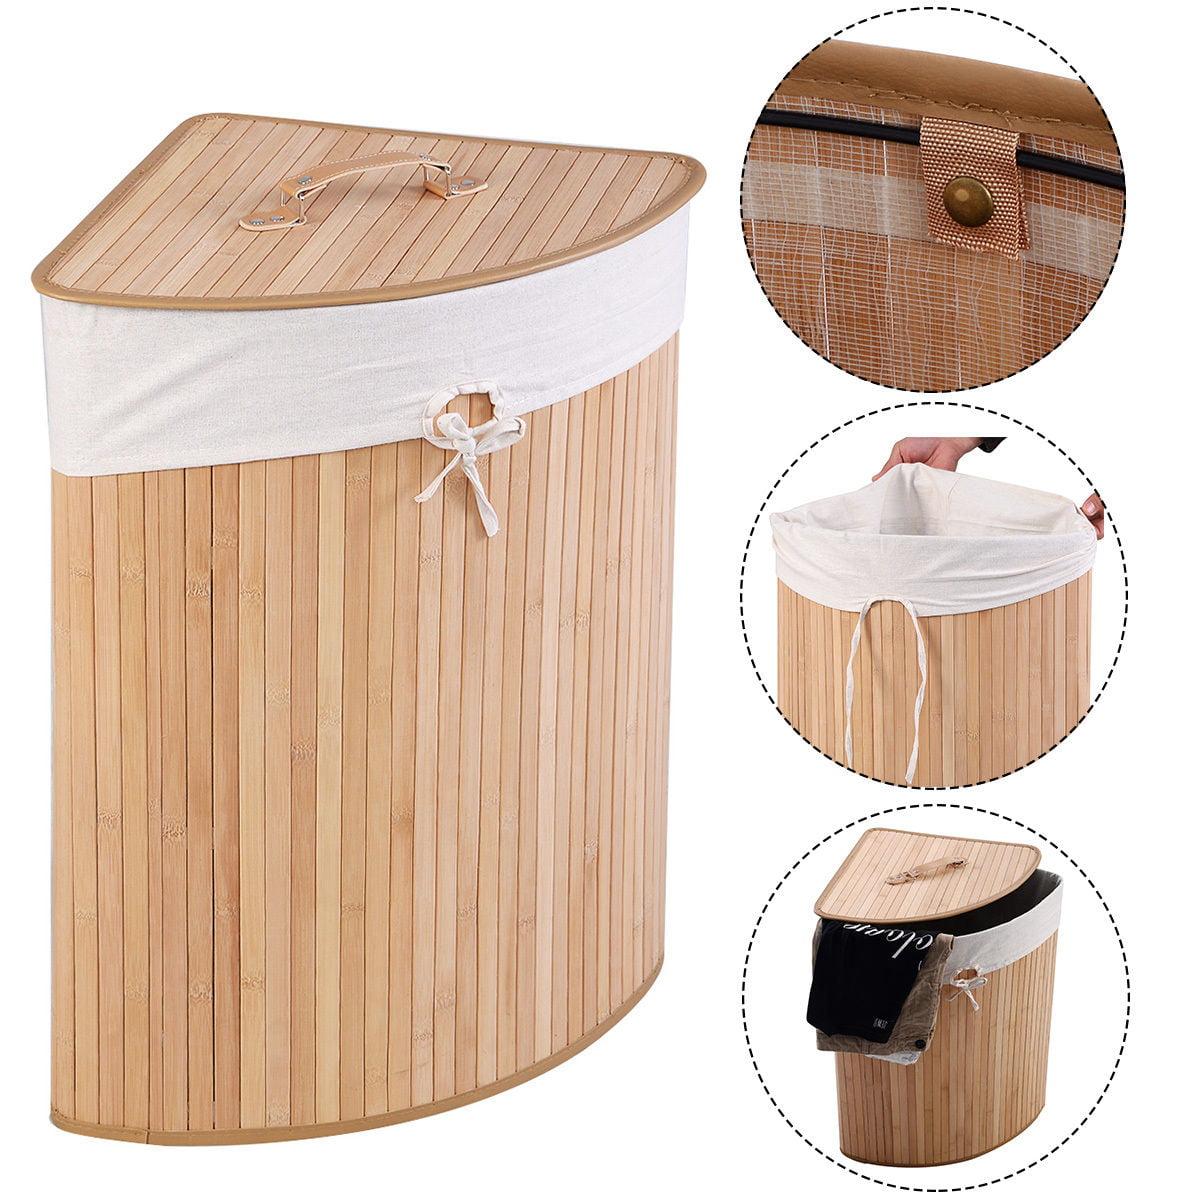 Costway Corner Bamboo Hamper Laundry Basket Washing Cloth Bin Storage Bag Lid Natural by Costway